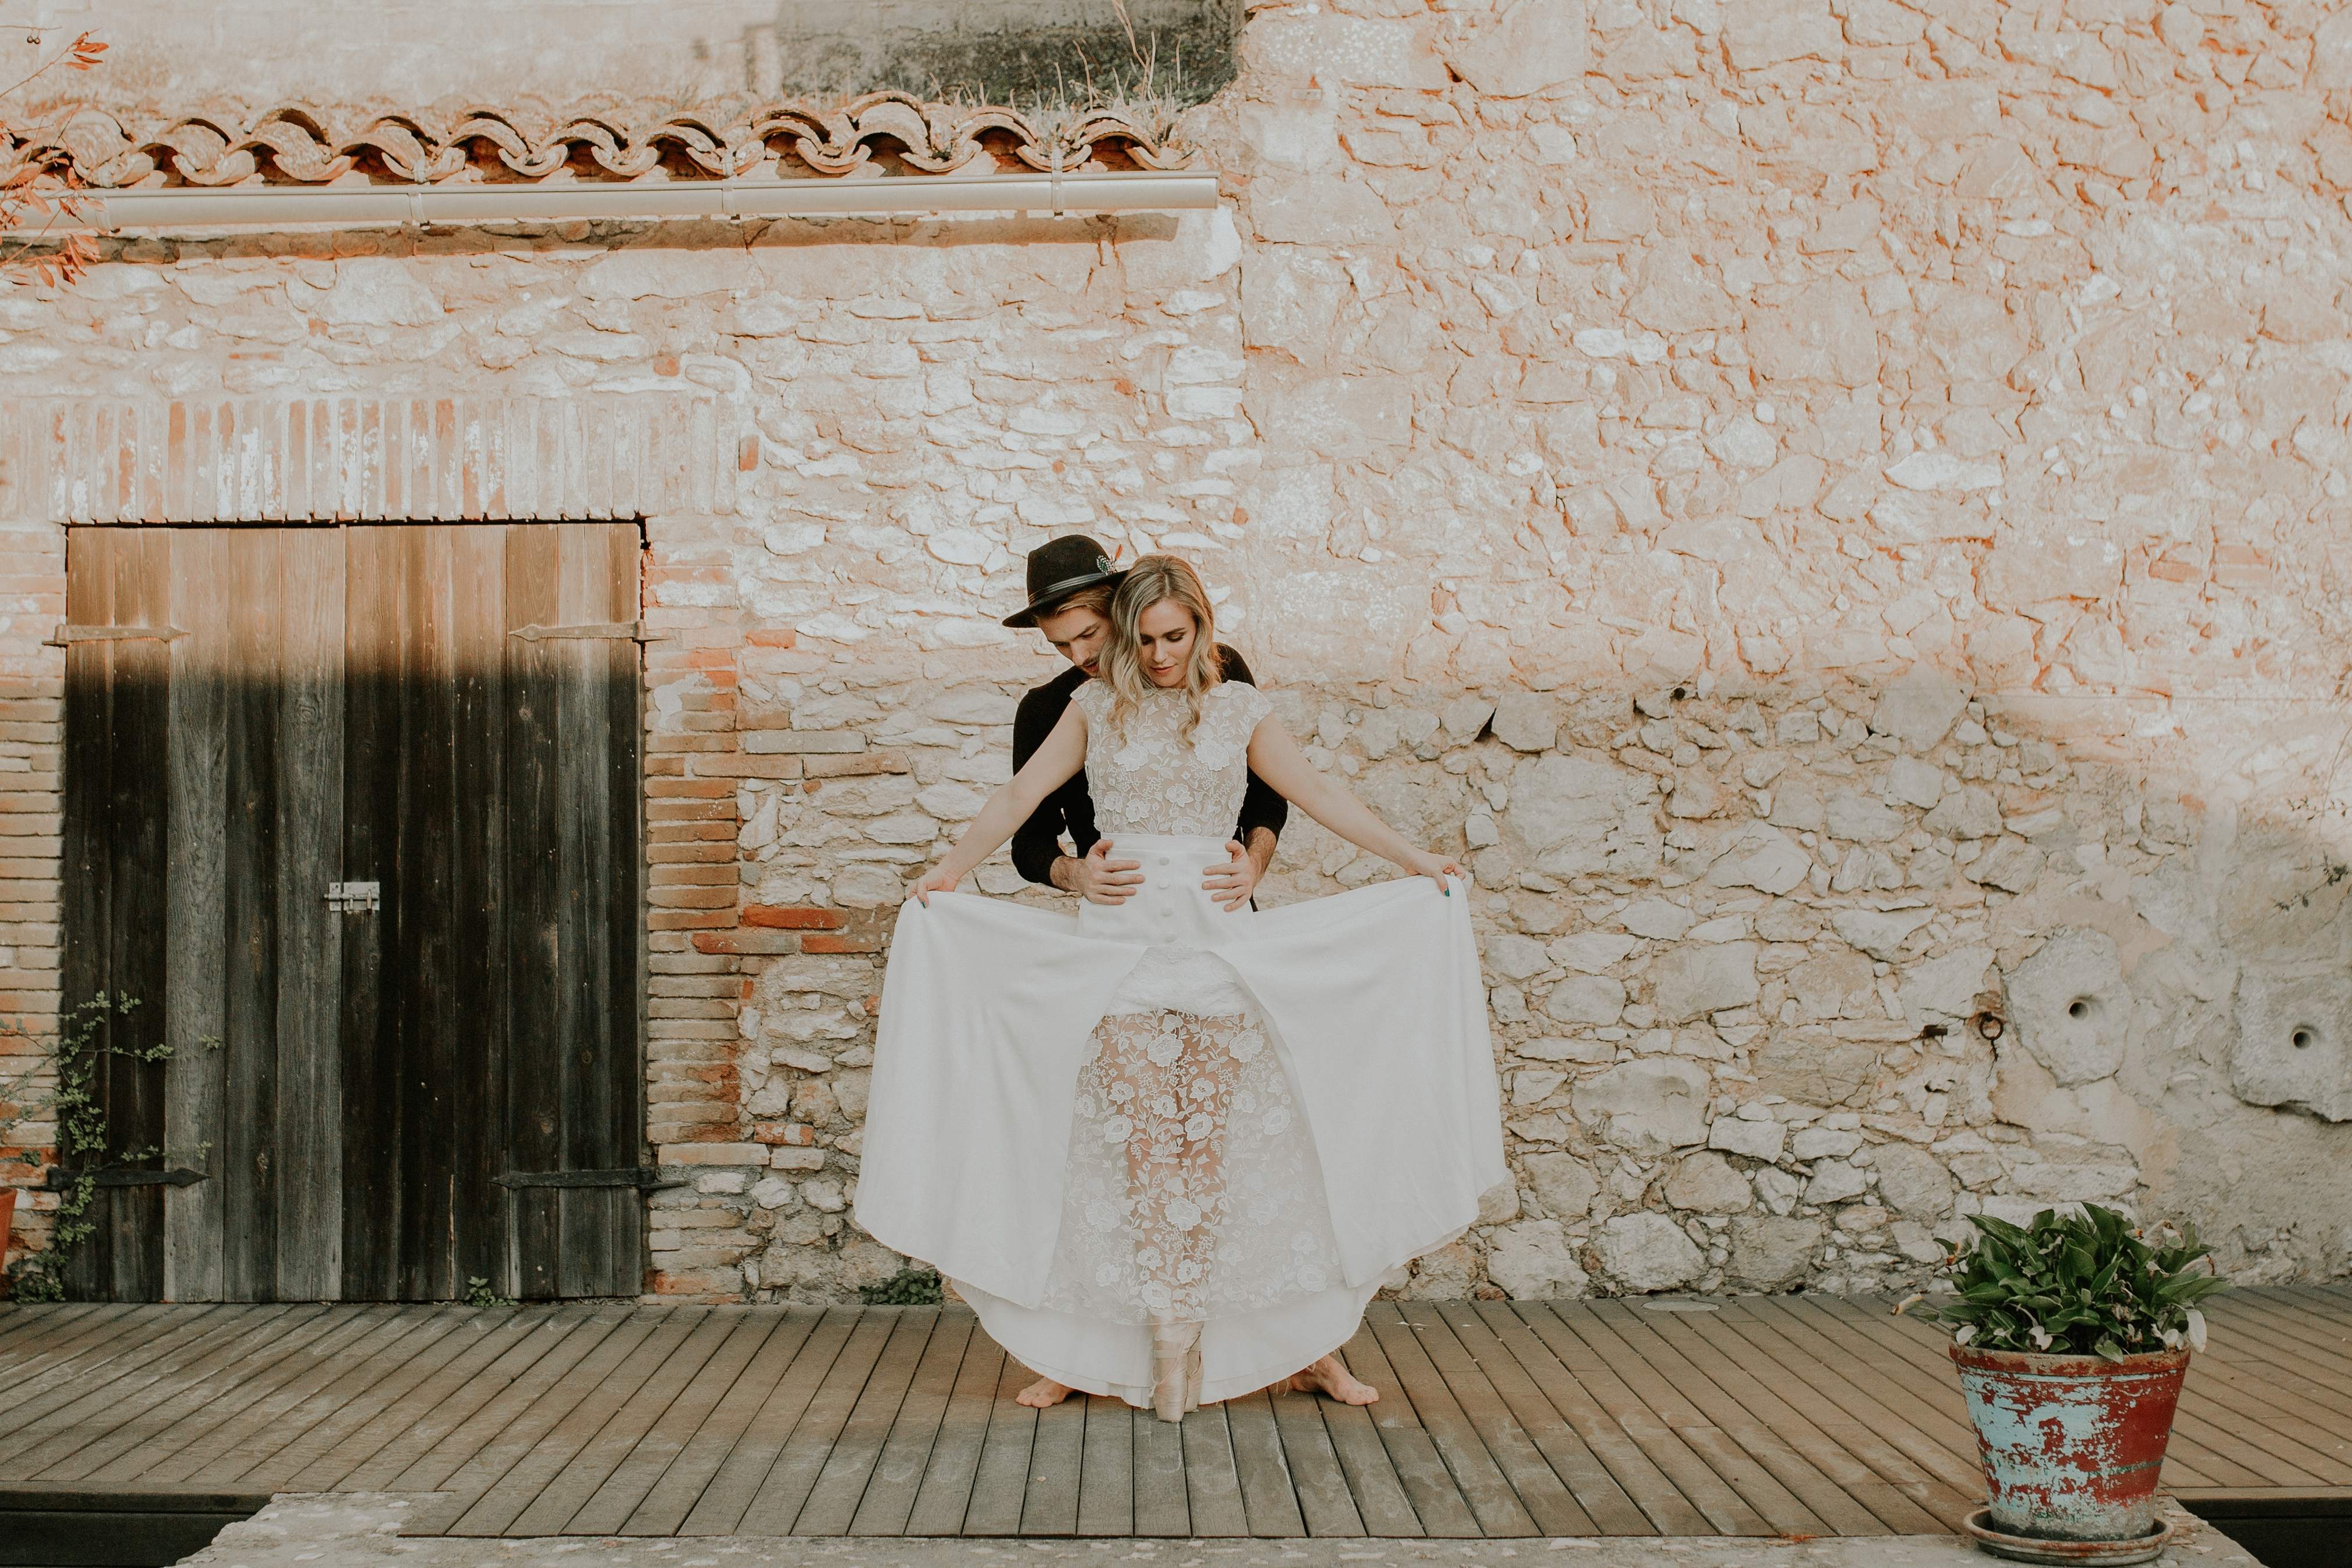 Destination Wedding Planner The Creatives Loft Wedding Studio and Vasver Photographers